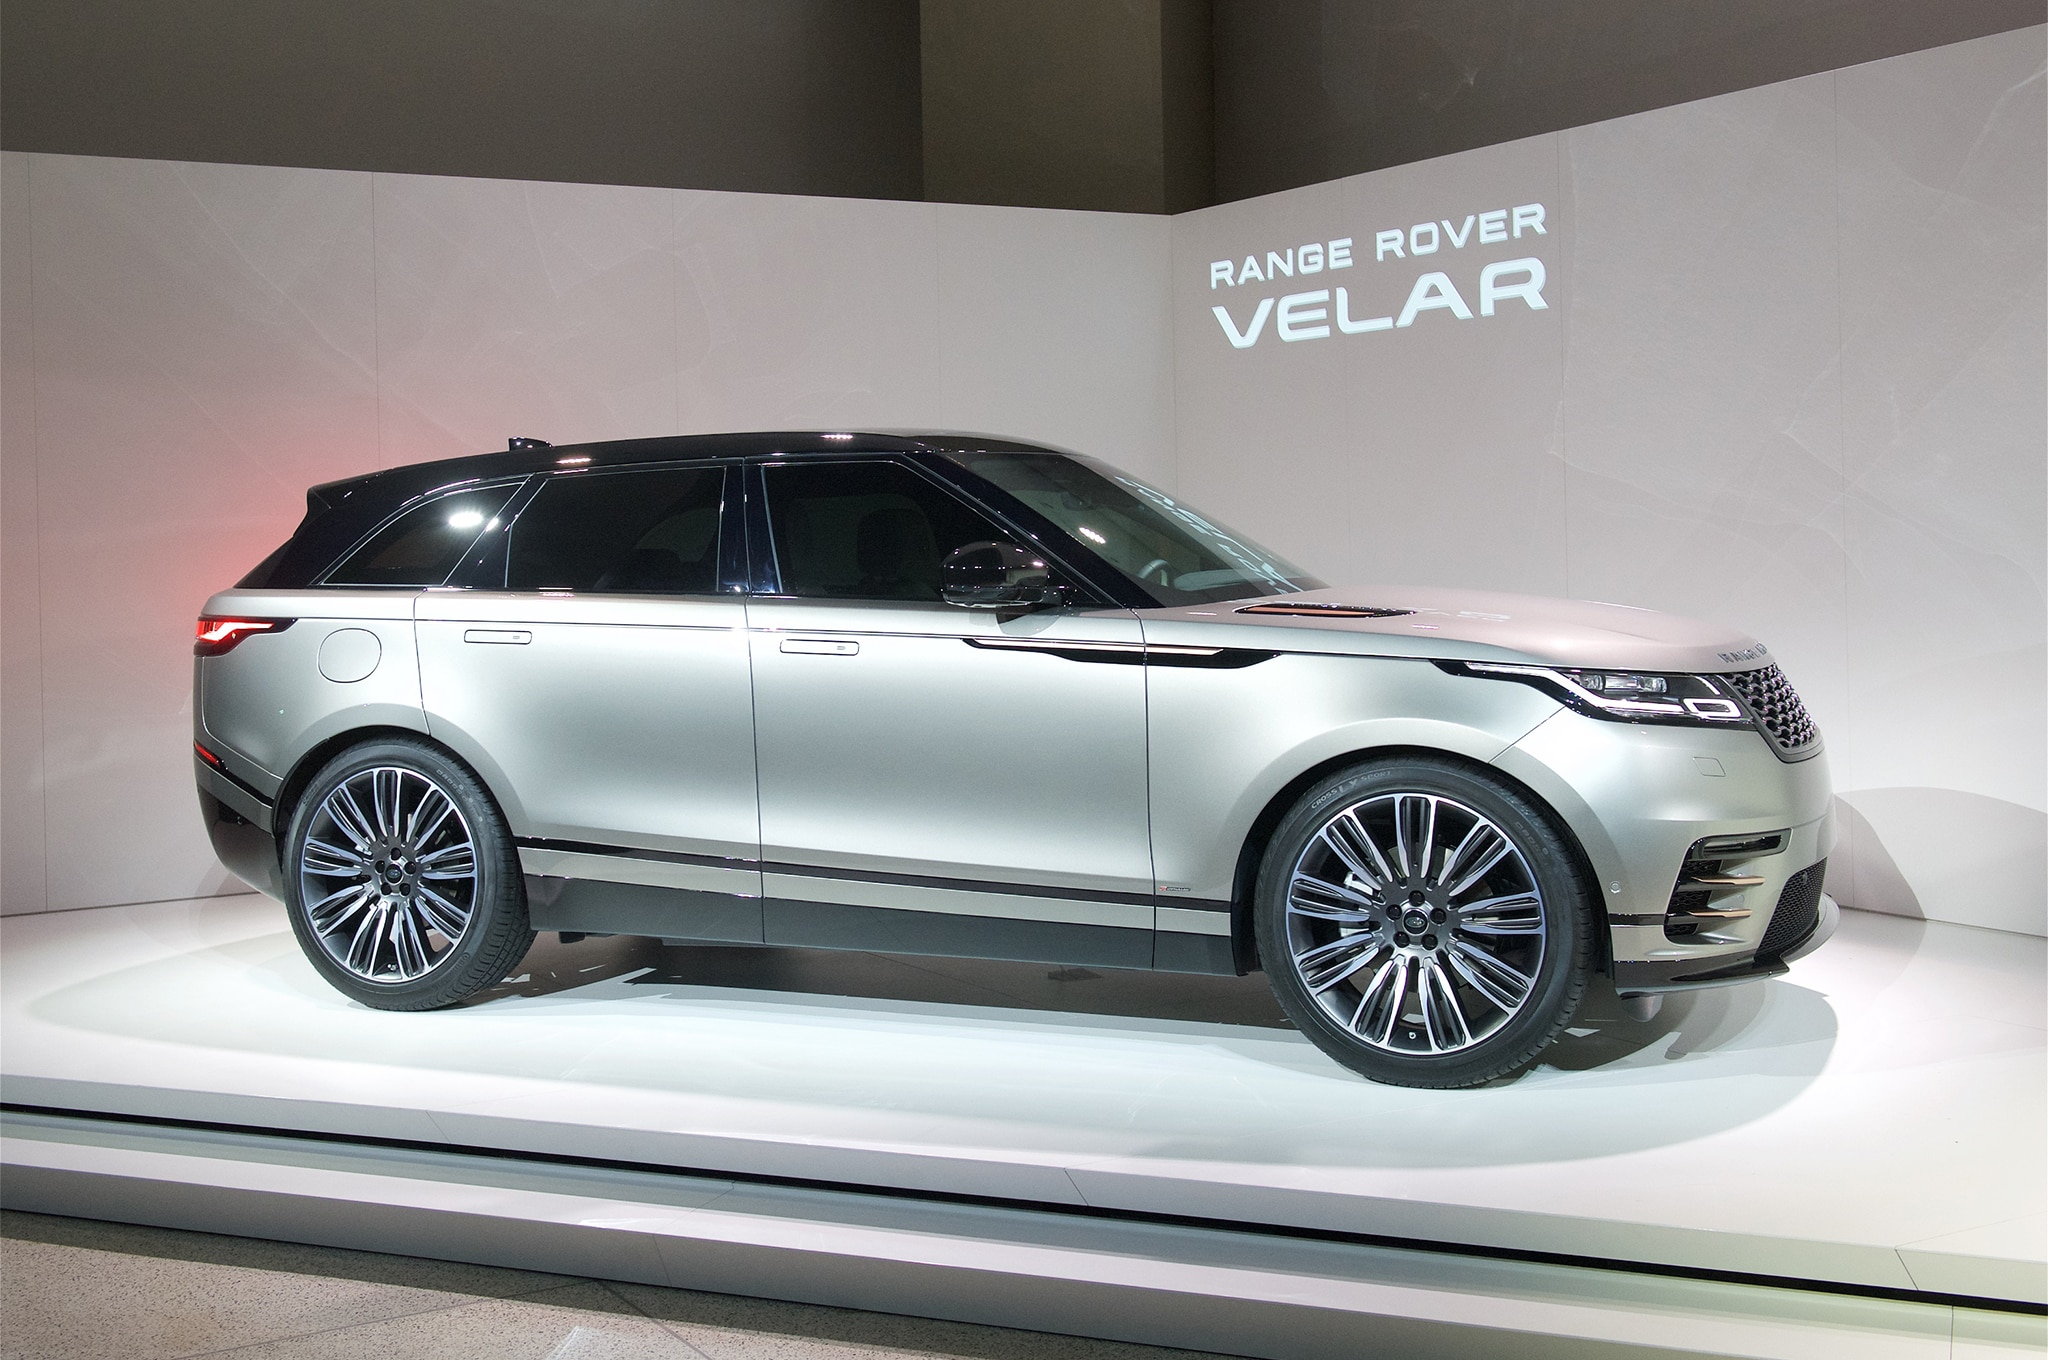 2018 Land Rover Range Rover Velar front side